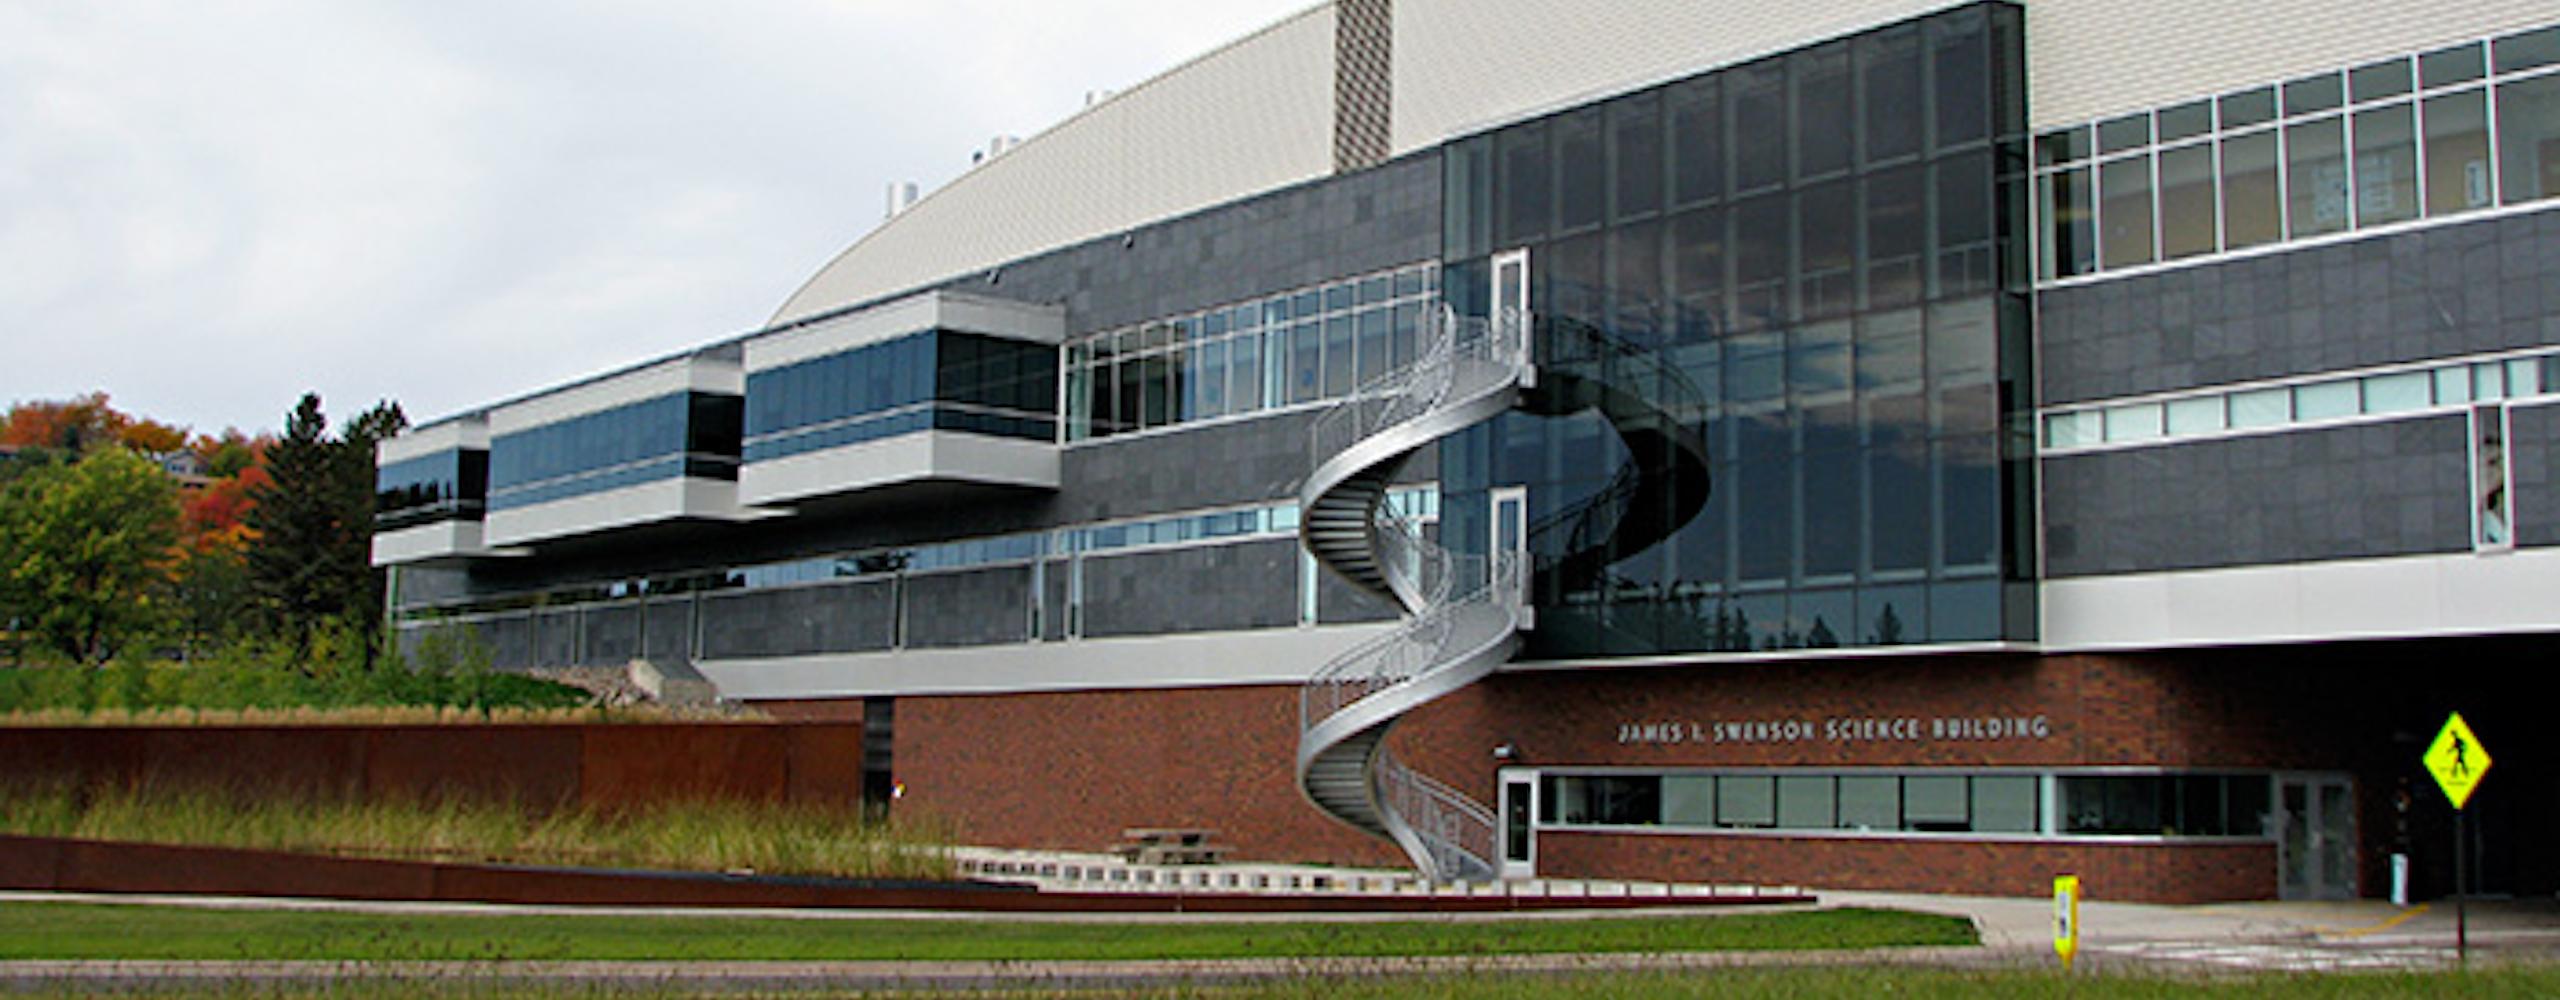 James I. Swenson Science Building